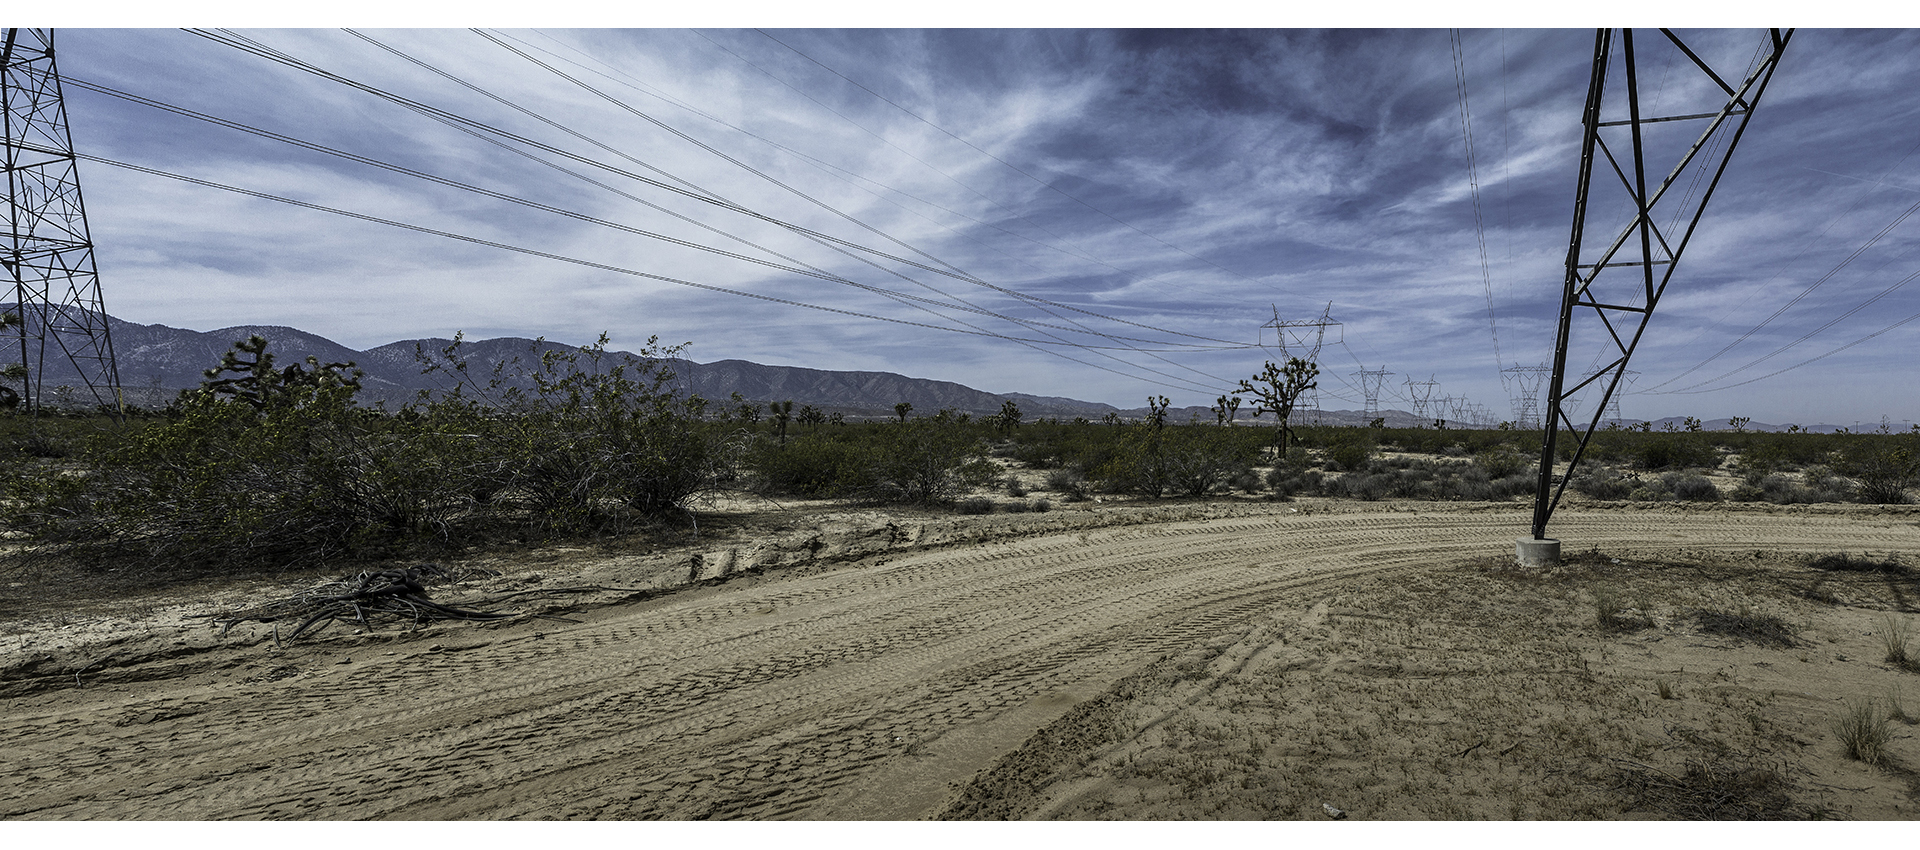 California©AntoninBonnet 5